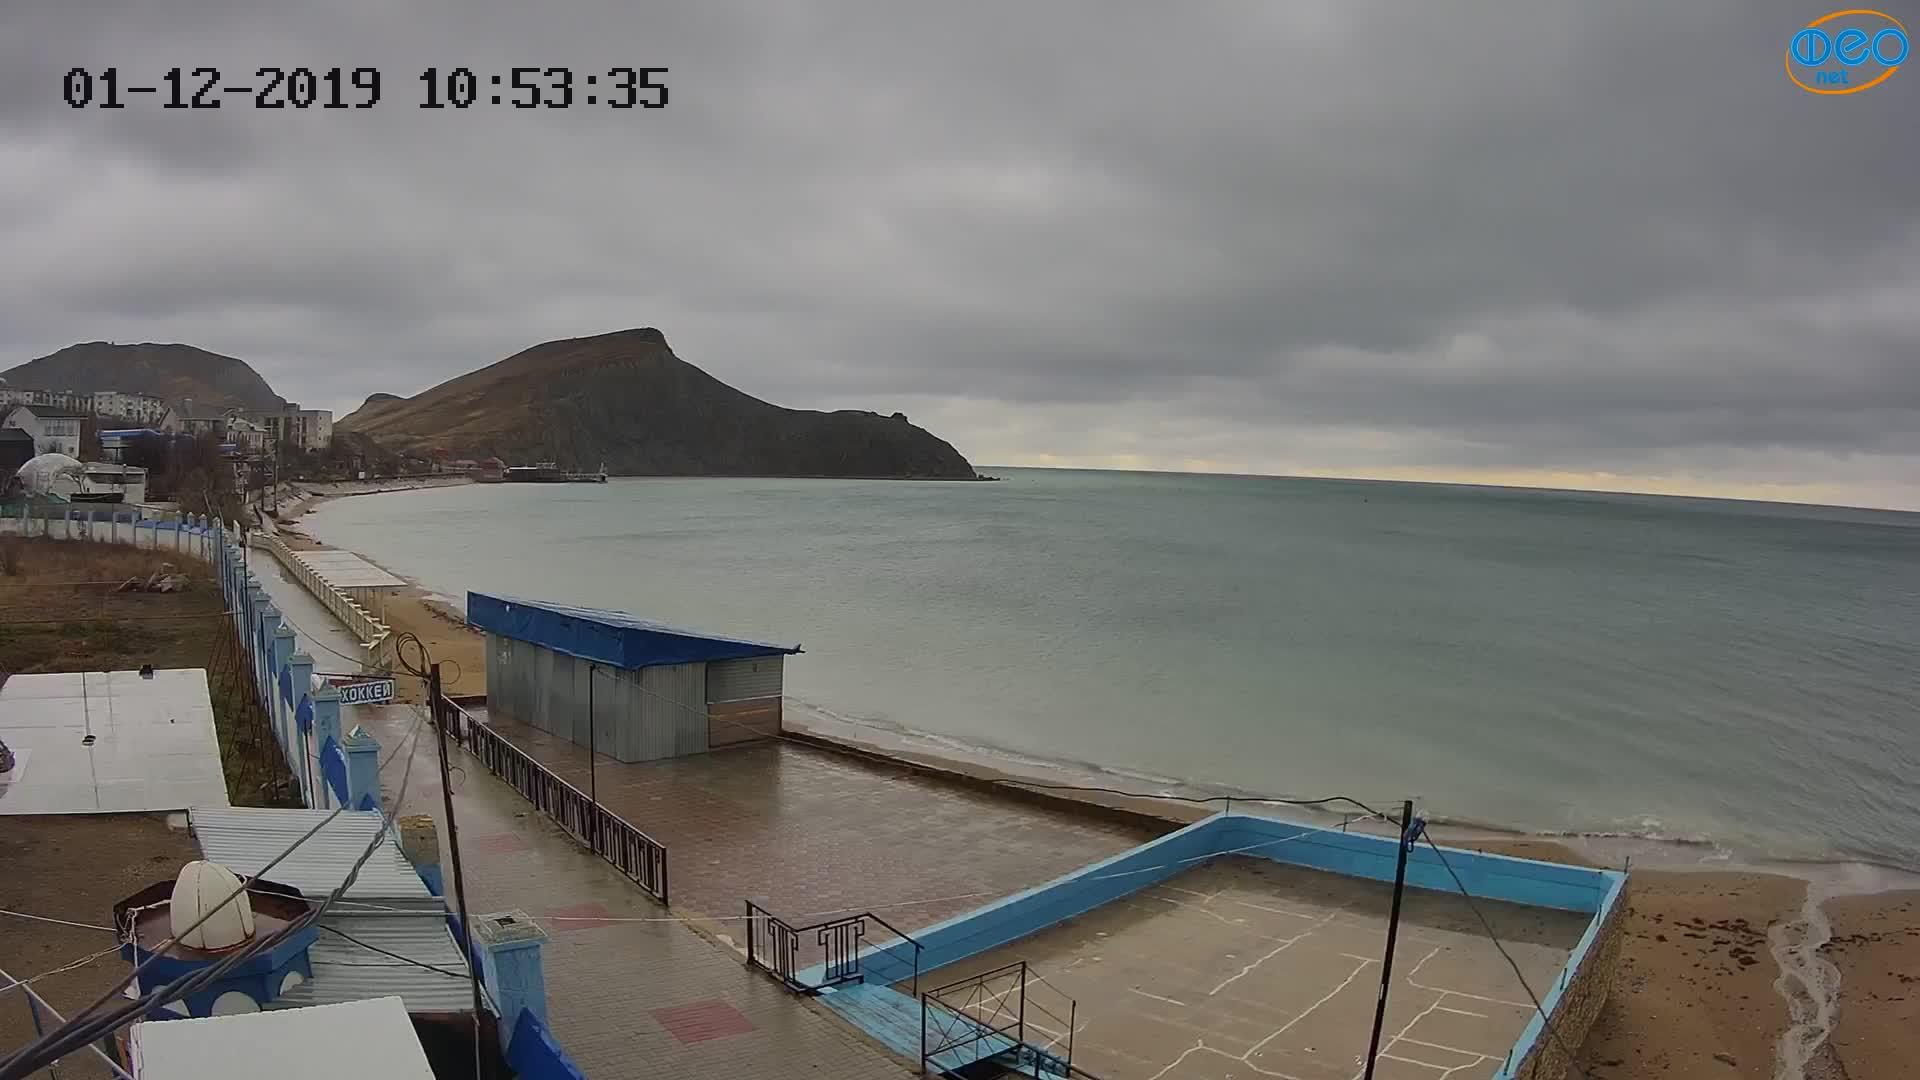 Веб-камеры Феодосии, Орджоникидзе - набережная - вид на Васюковку, 2019-12-01 11:15:45